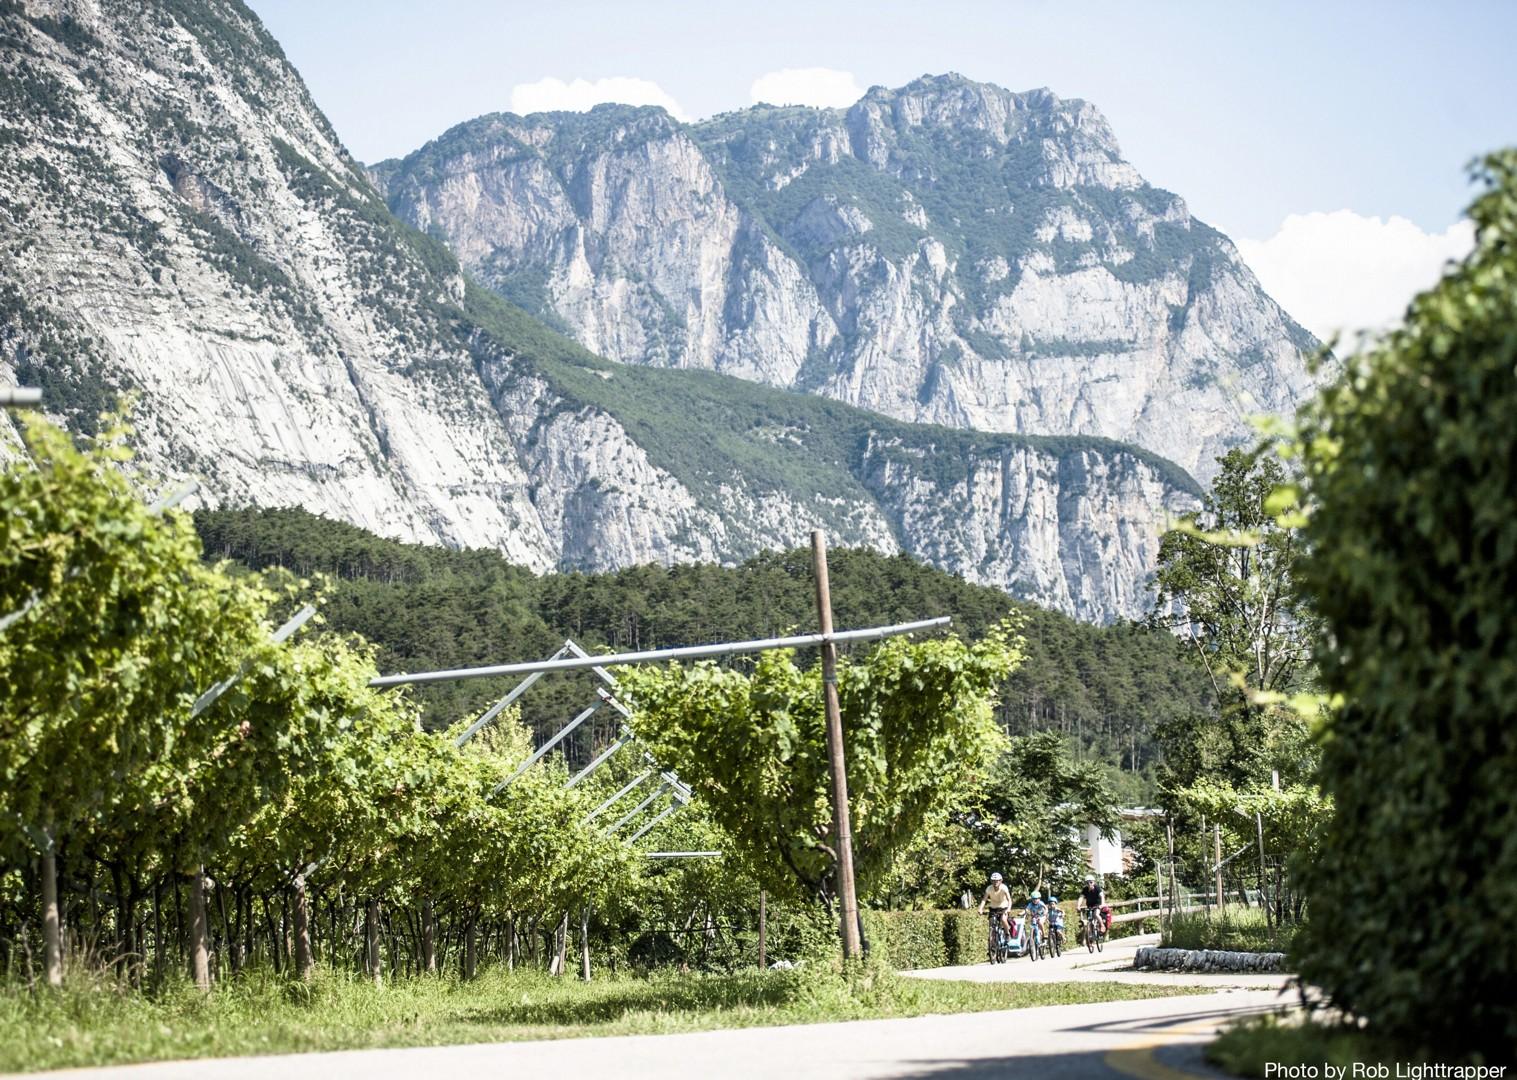 Family-Cycling-Holiday-Lake-Garda-Venice-mountains-of-Italy.jpg - Italy - Lake Garda to Venice - Self-Guided Family Cycling Holiday - Italia Leisure and Family Cycling